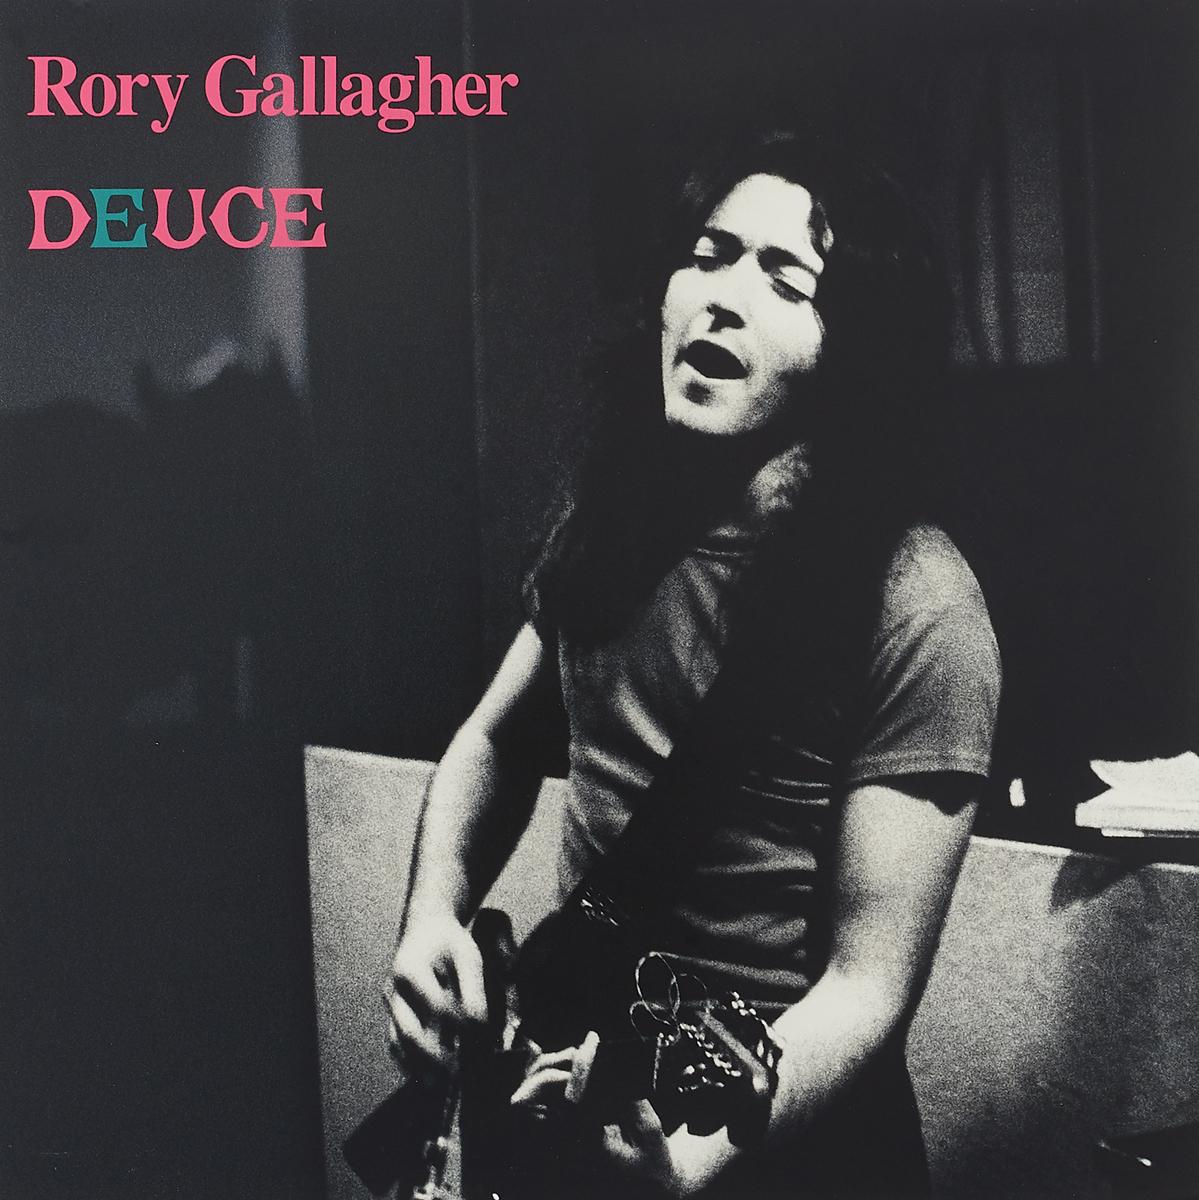 Рори Галлахер Rory Gallagher. Deuce (LP) рори галлахер gallagher rory live in europe hq lp